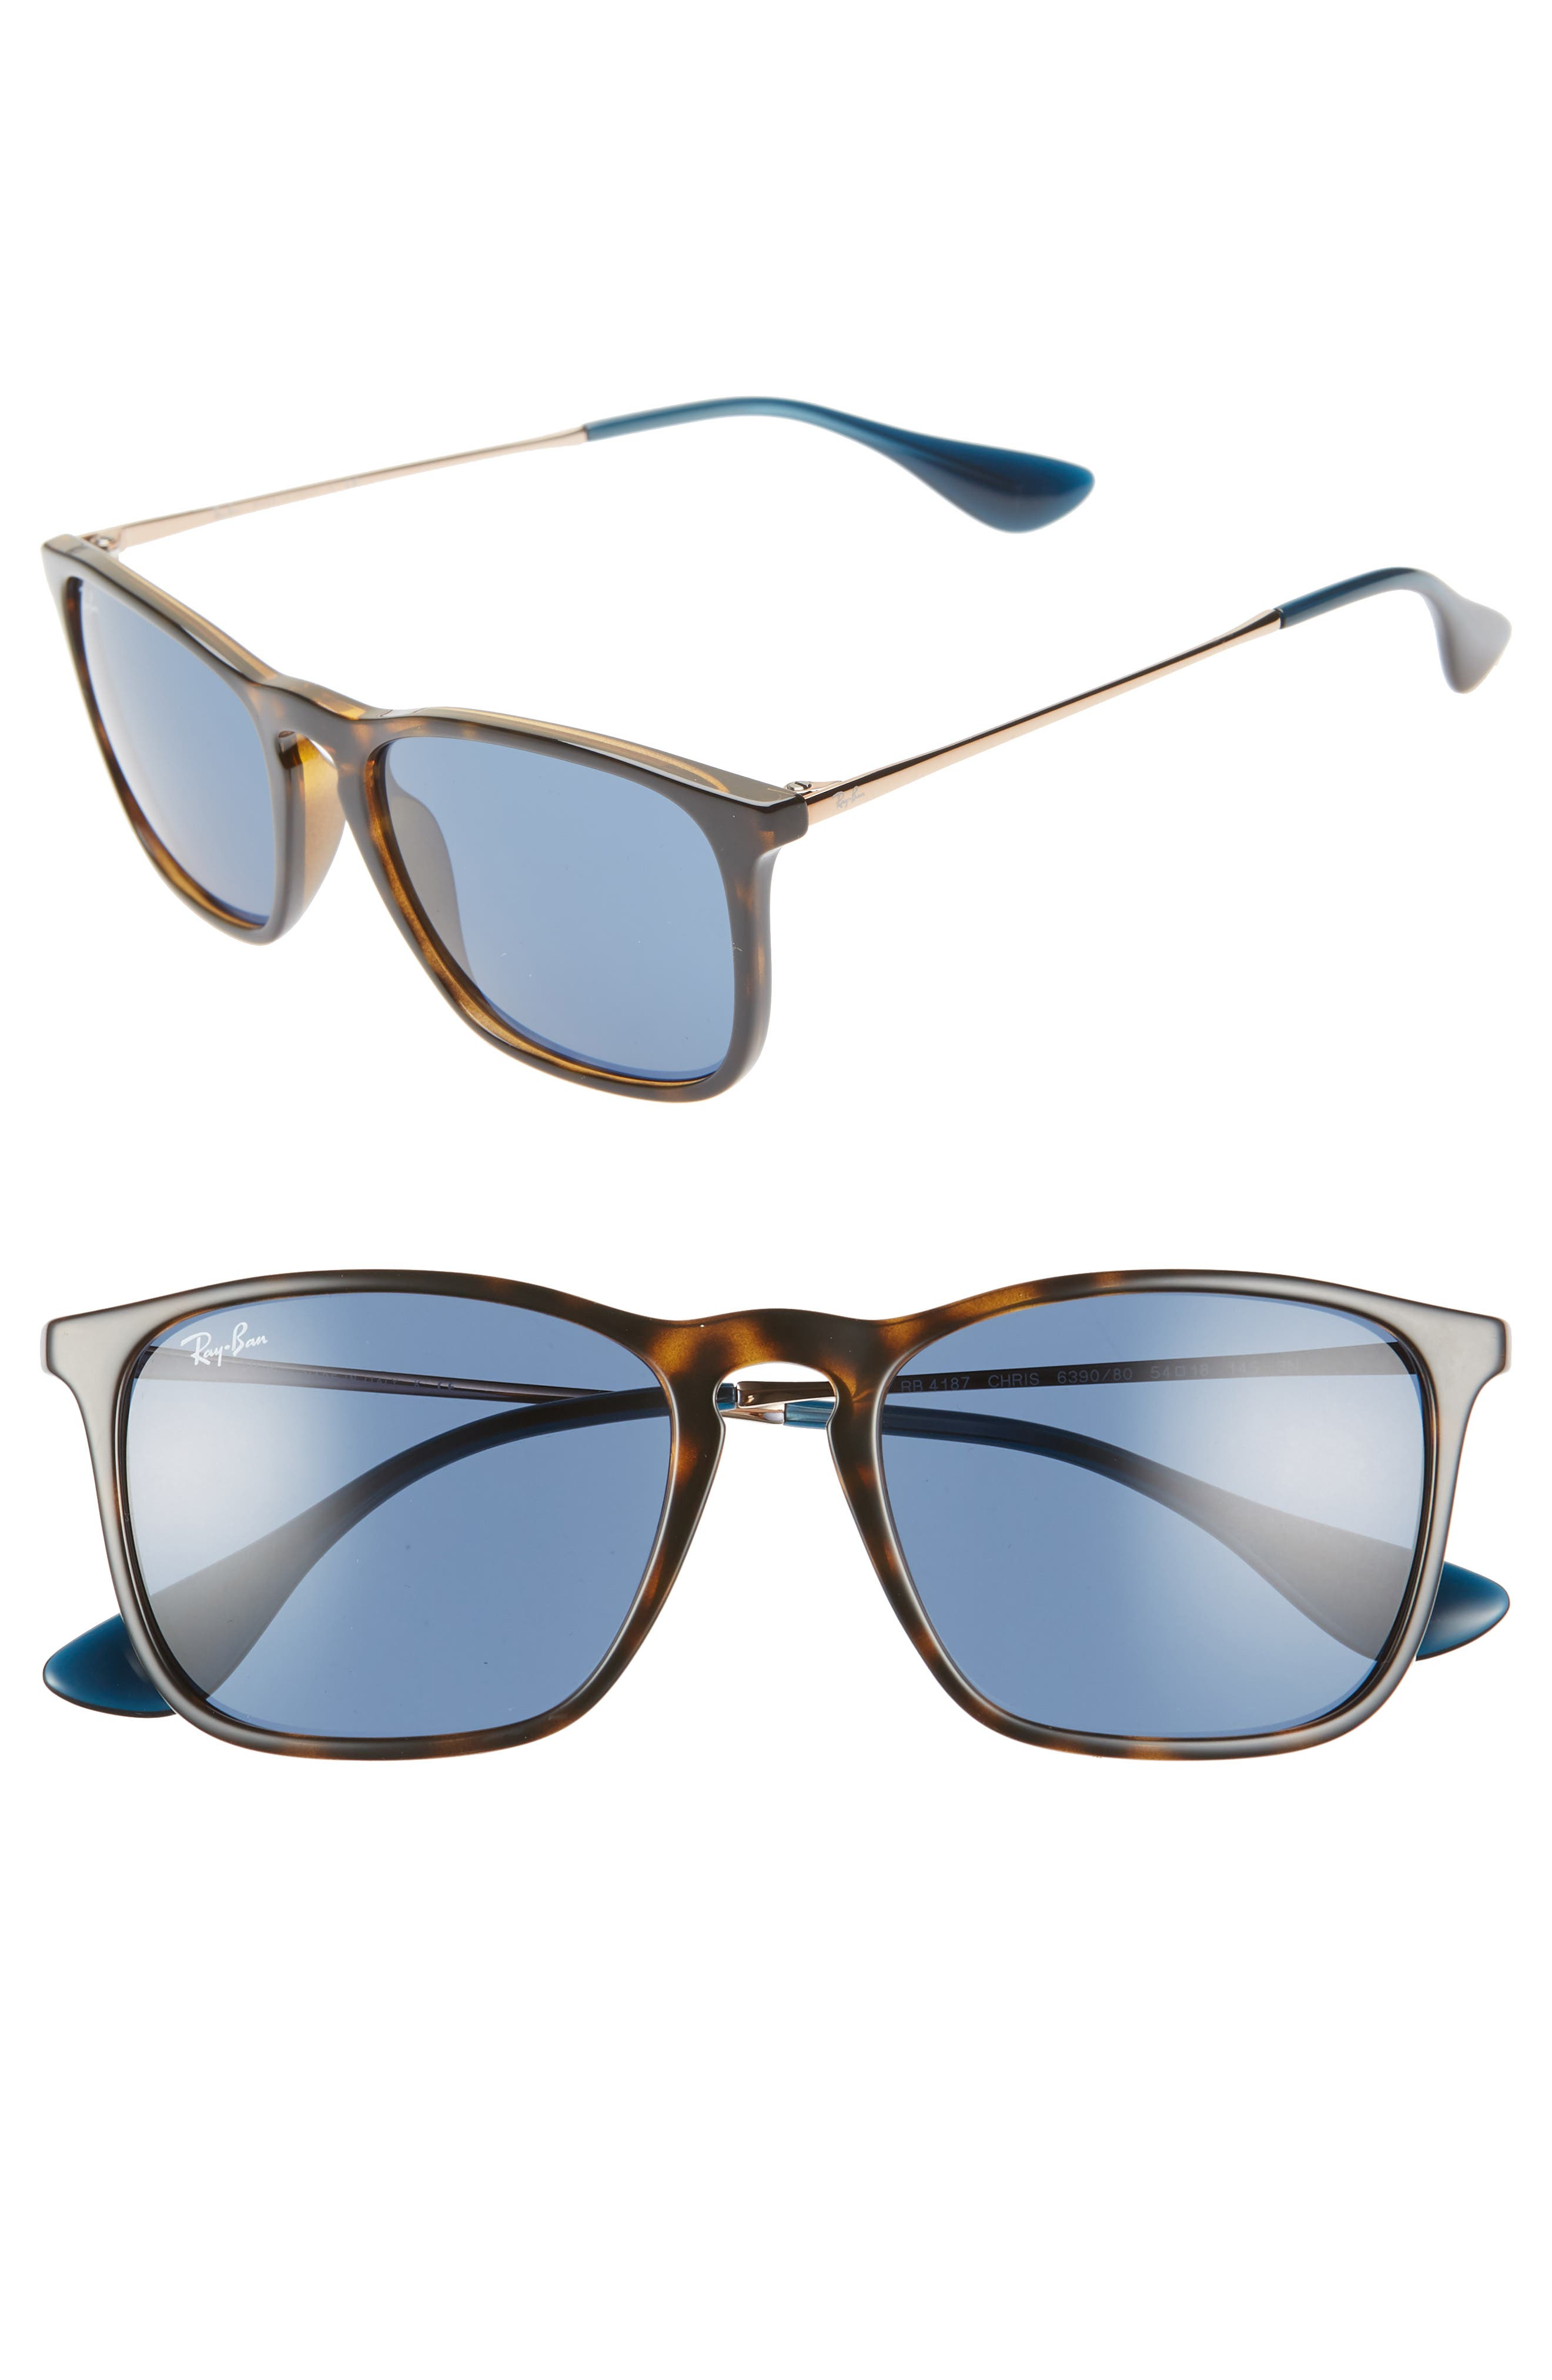 f6a2b16d0cf0 Men's Sunglasses - Ray-Ban